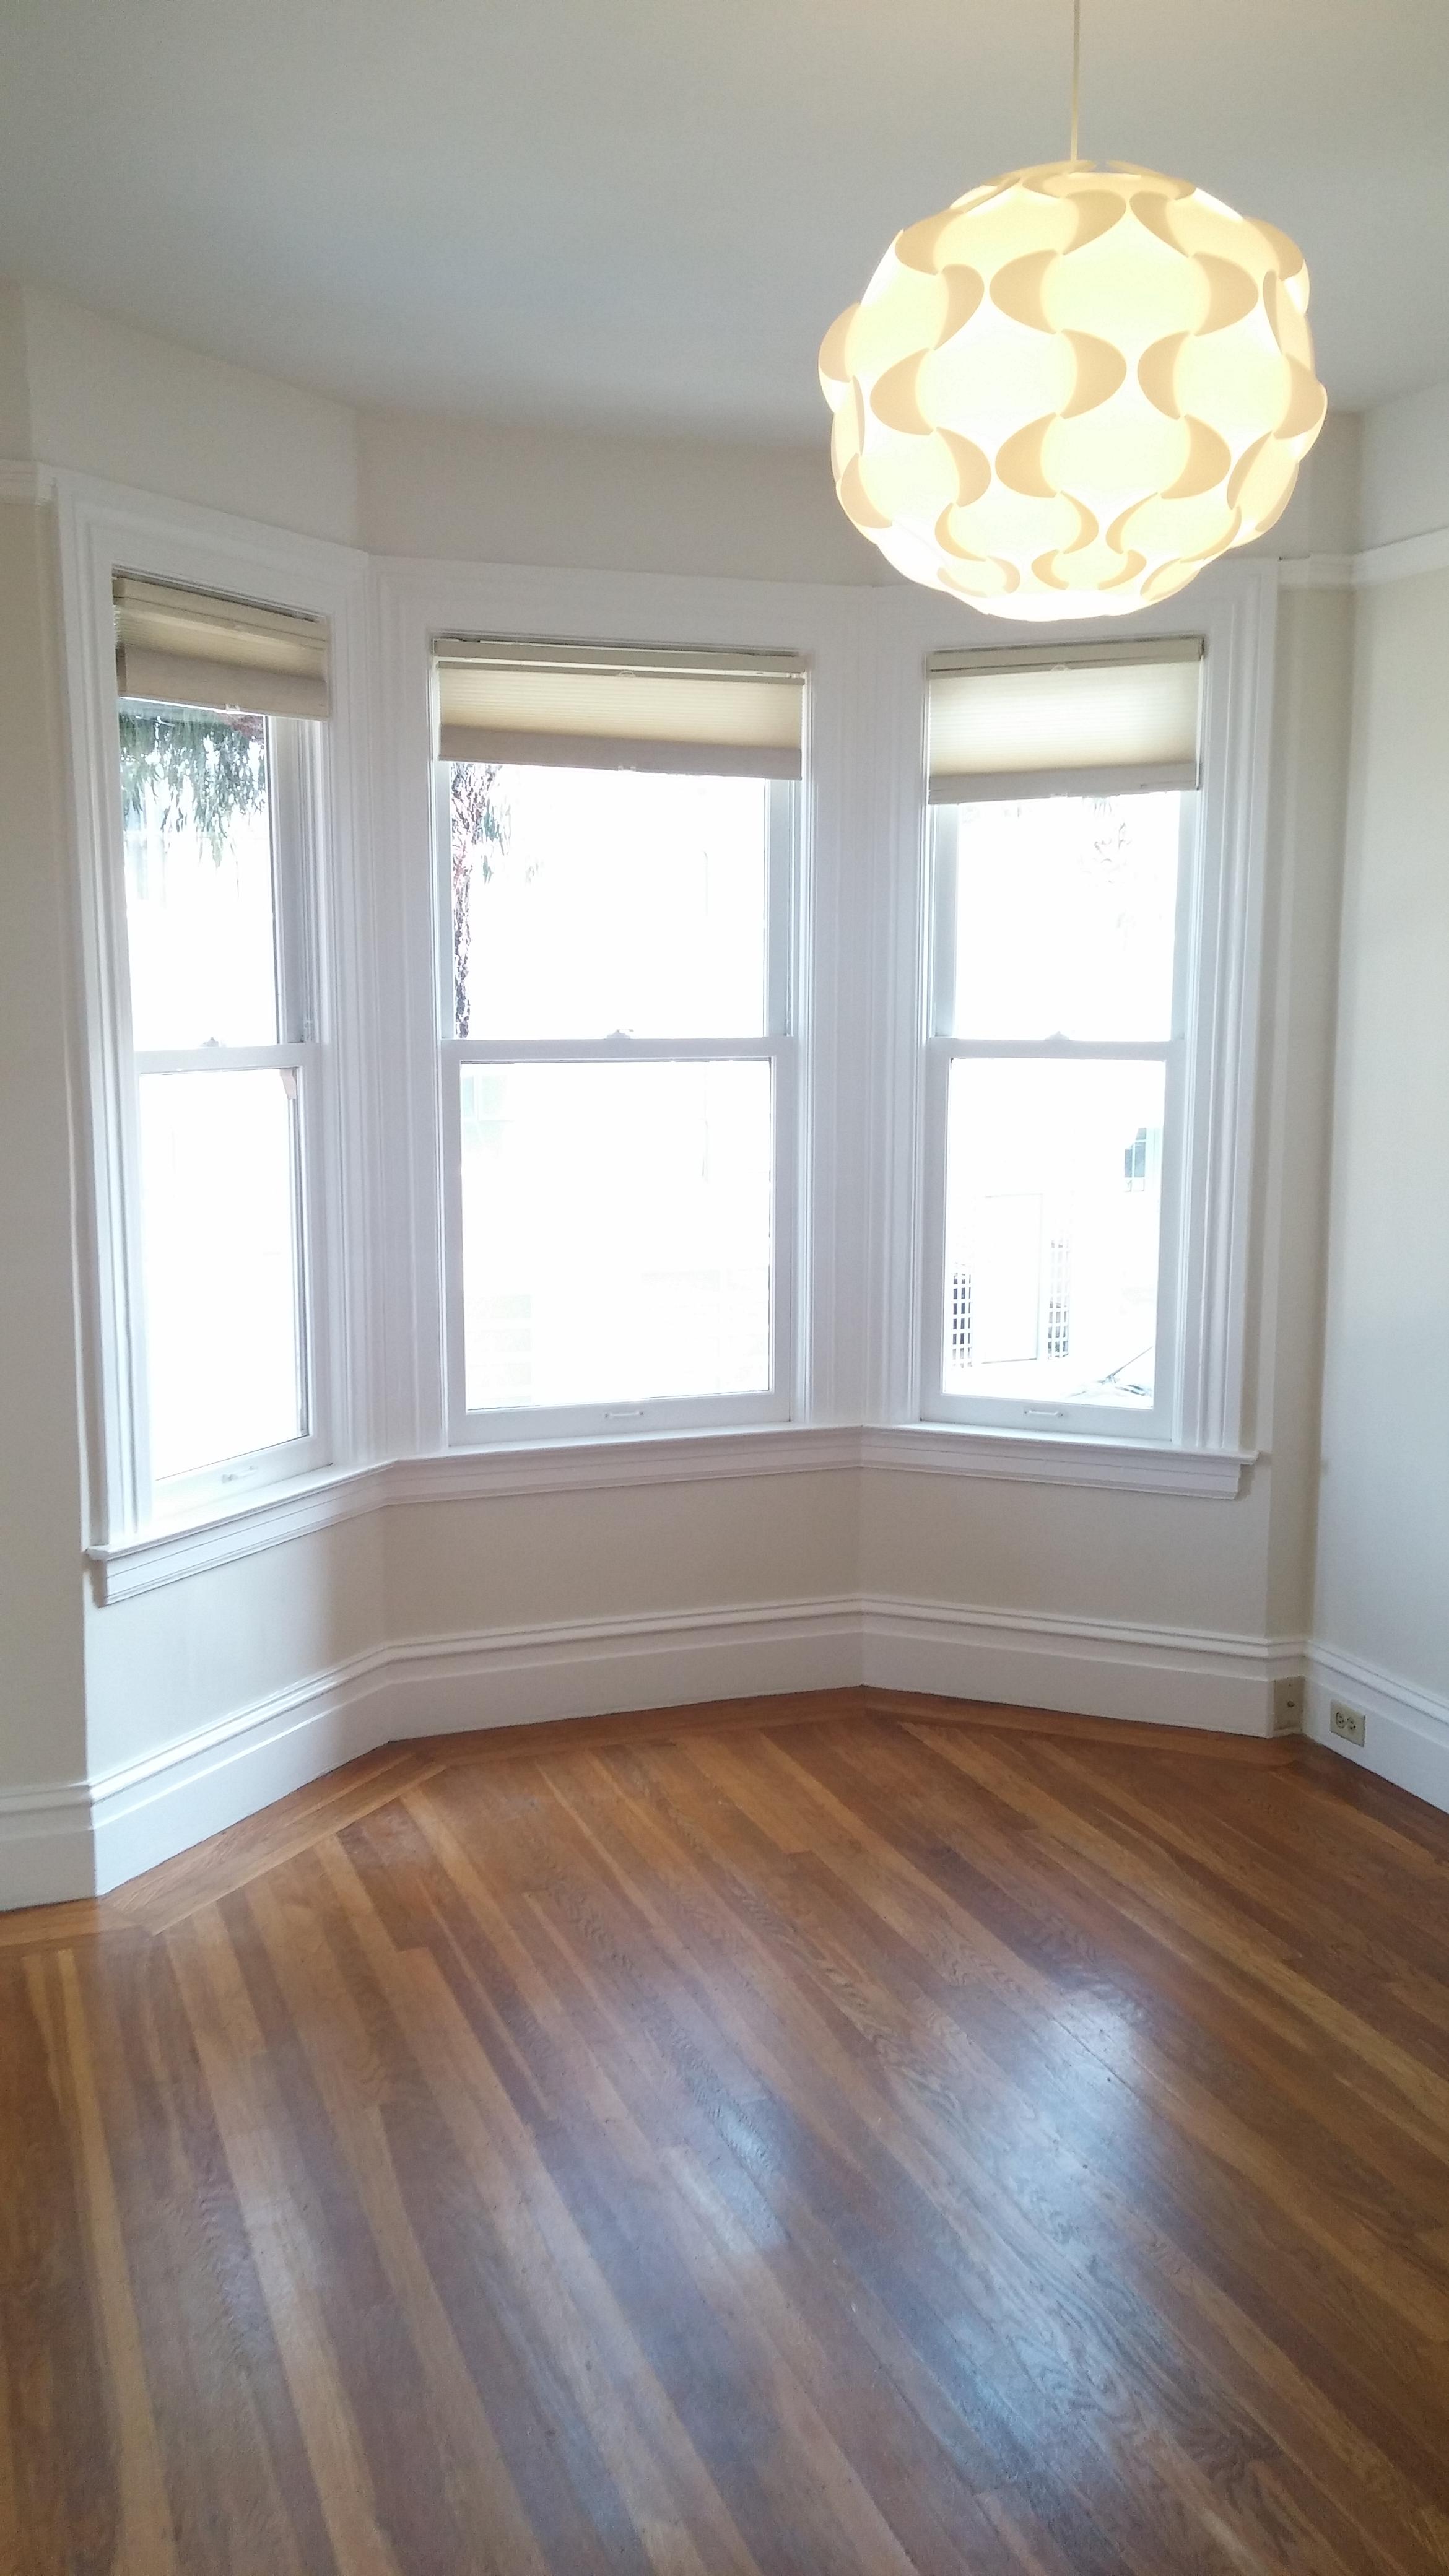 164 Lundys Ln San Francisco CA 94110 2 Bedroom Apartment For Rent PadMa